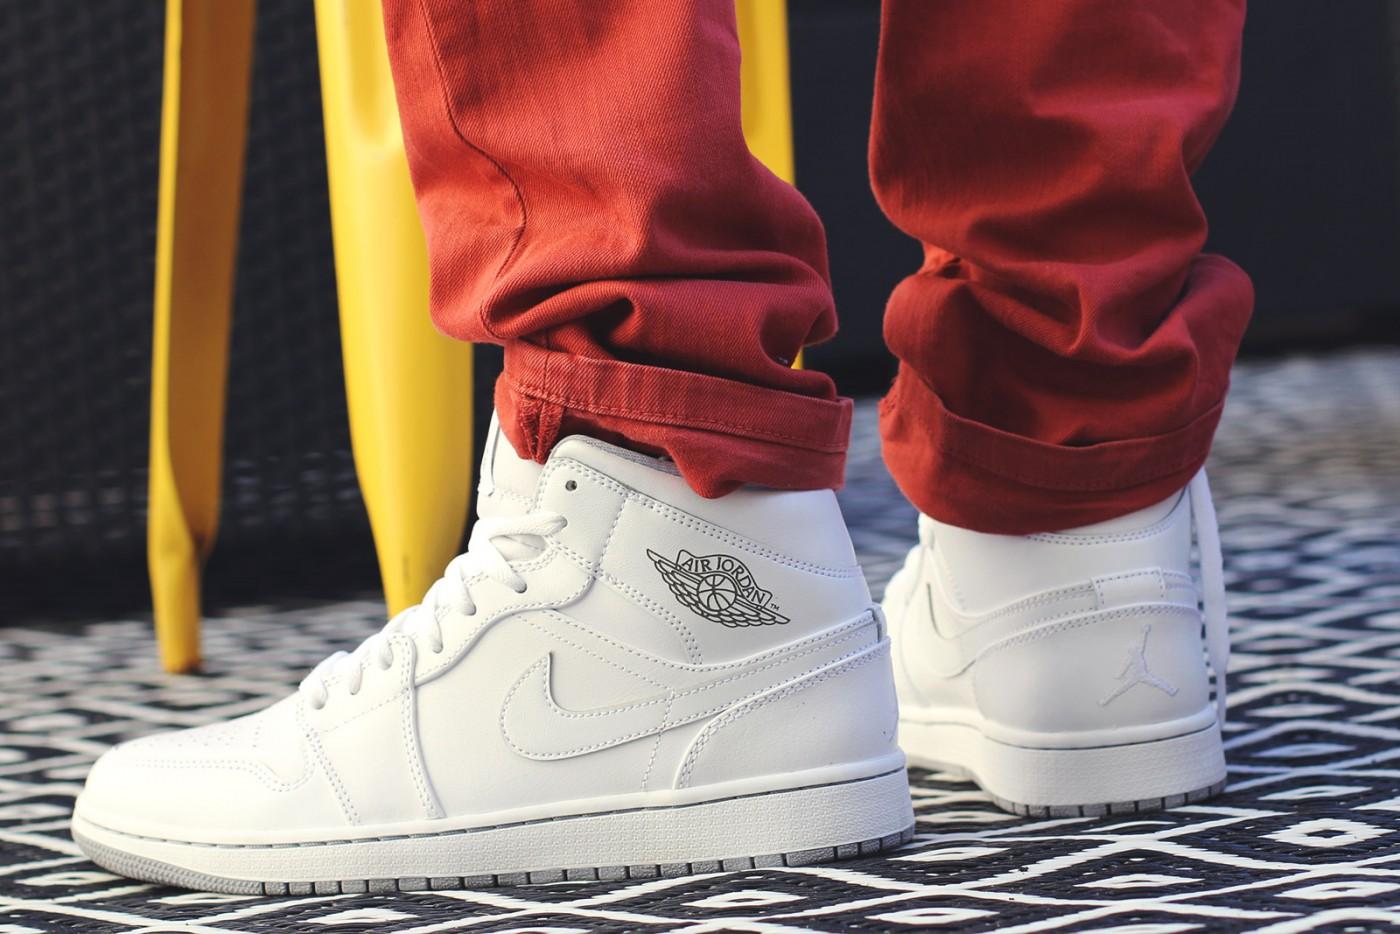 Nike Air Jordan – Rentrez dans la légende